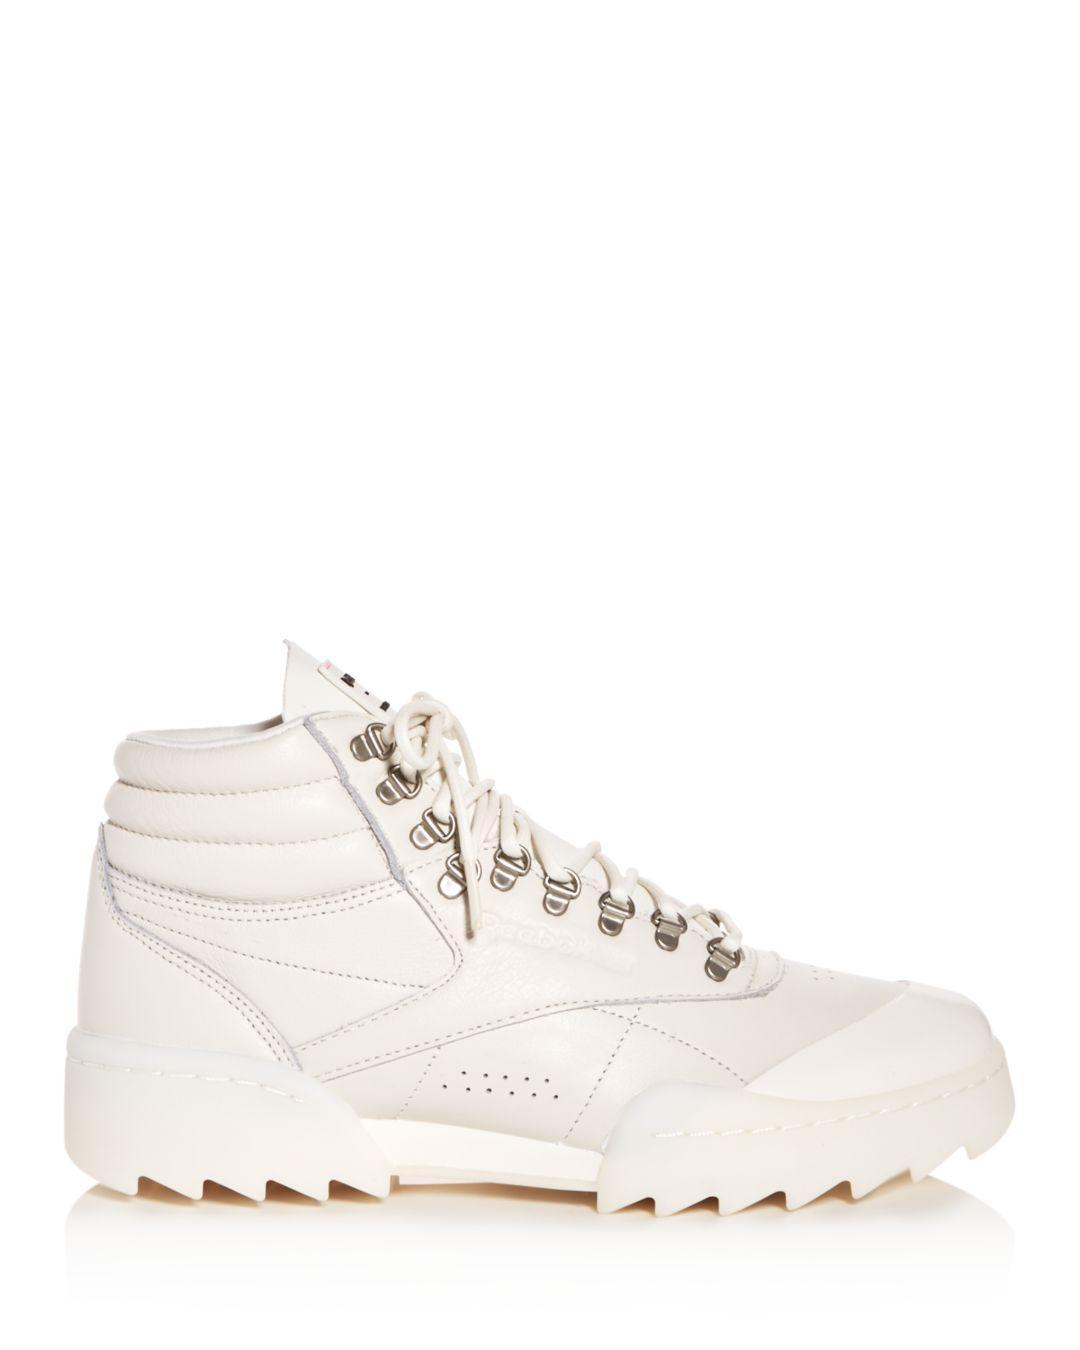 da80409b3dd Lyst - Reebok Women s Freestyle Hi Nova Ripple X Gigi Hadid High-top  Sneakers